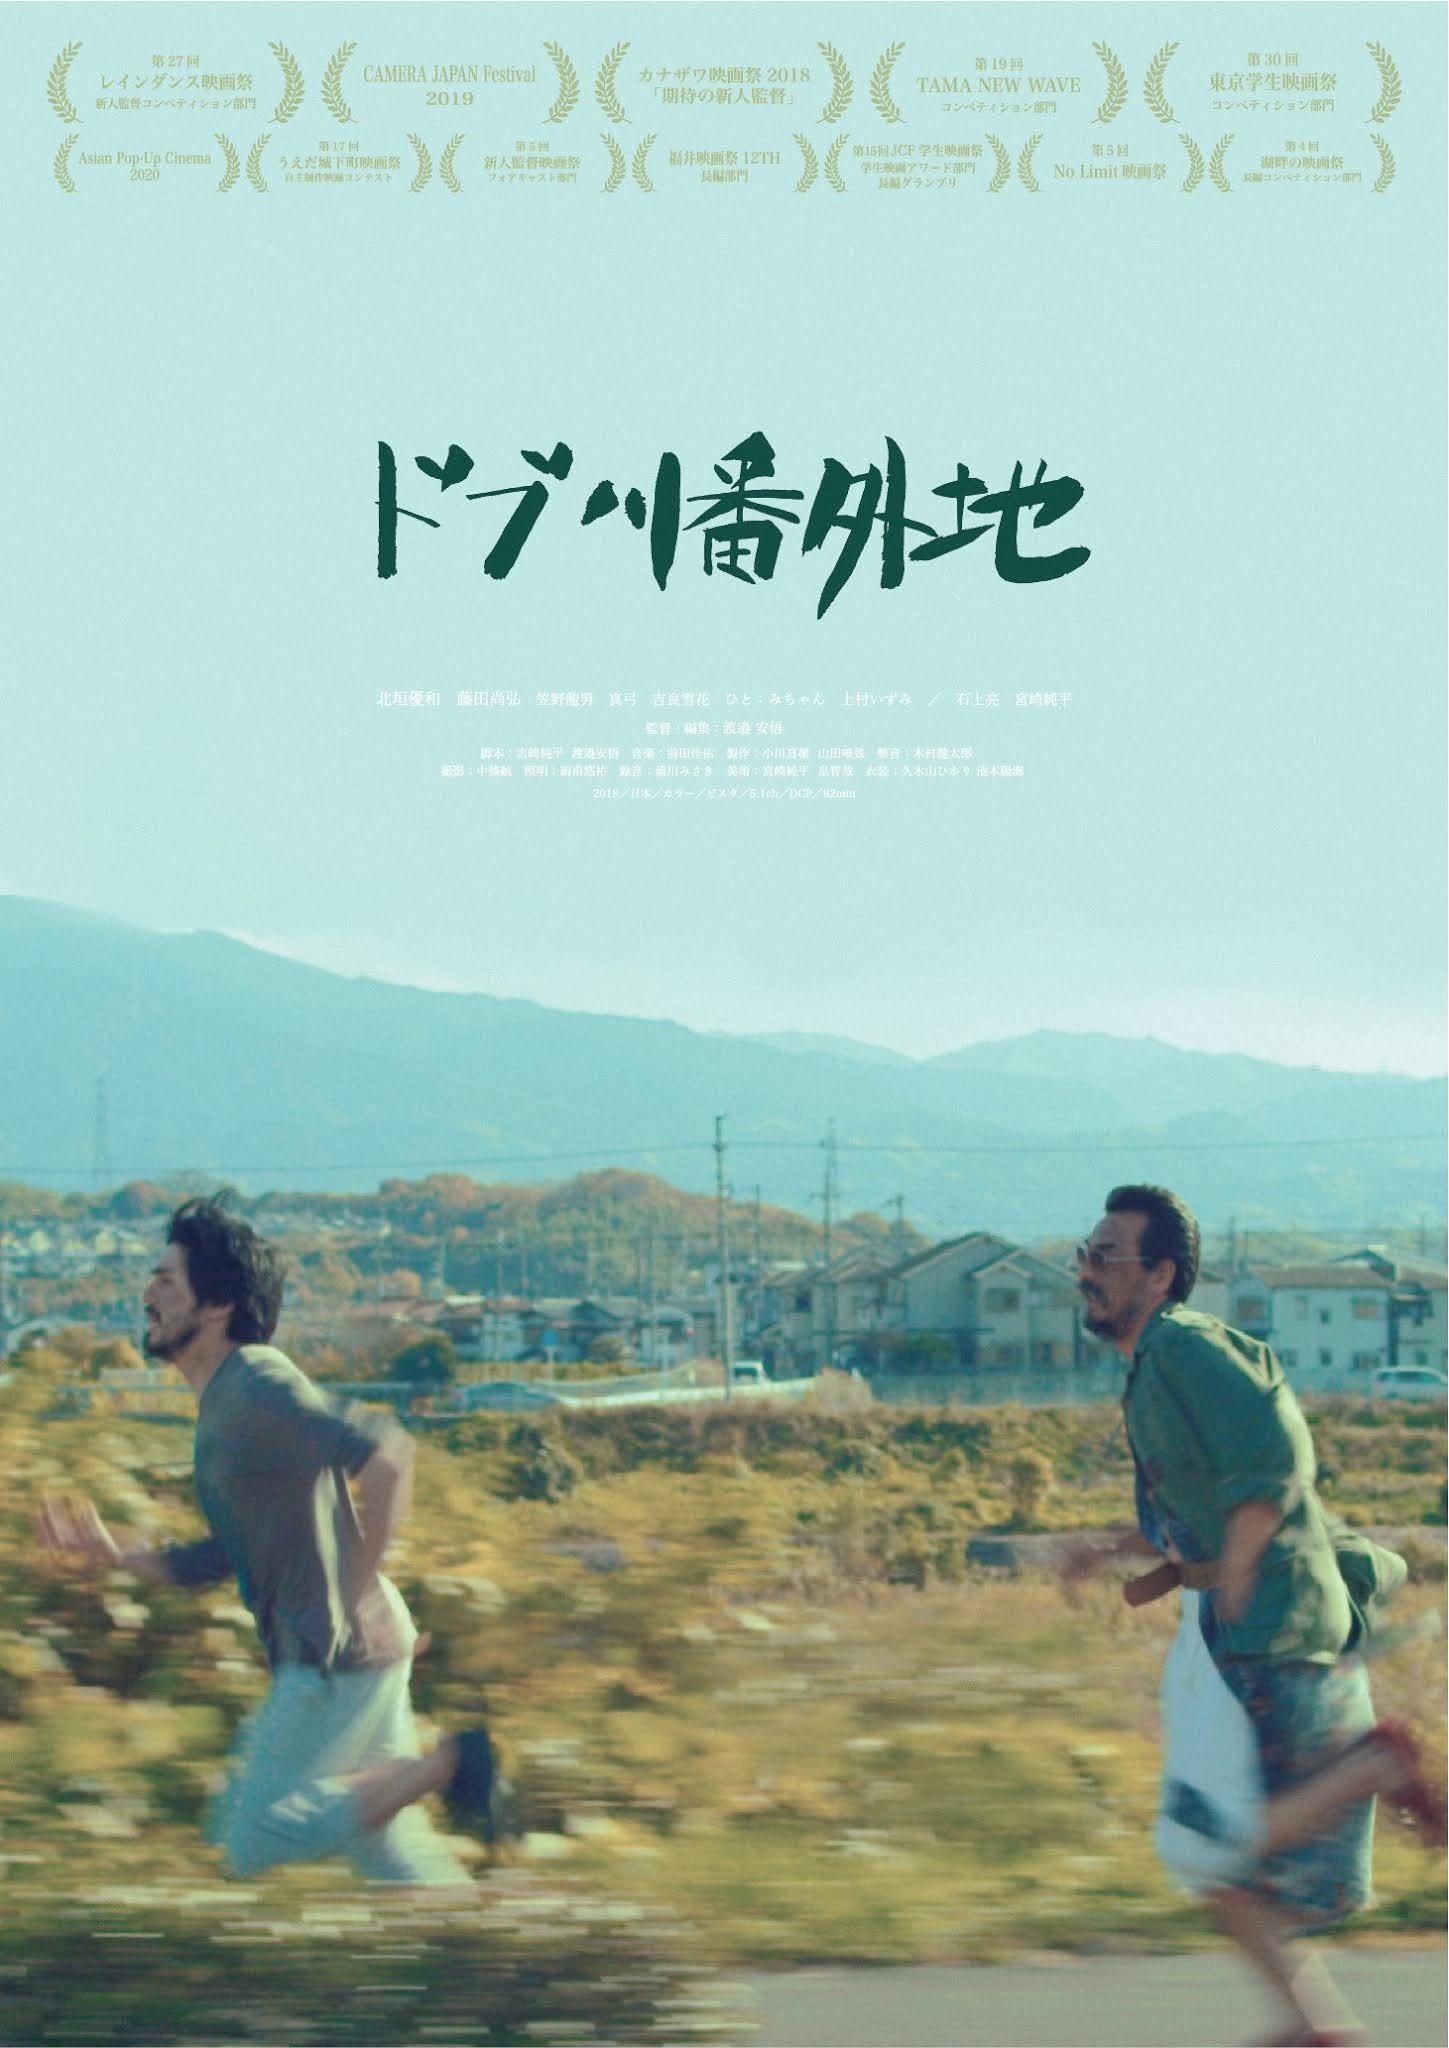 A Dobugawa Dream (Dobugawa Bandaichi) film - Asato Watanabe - poster